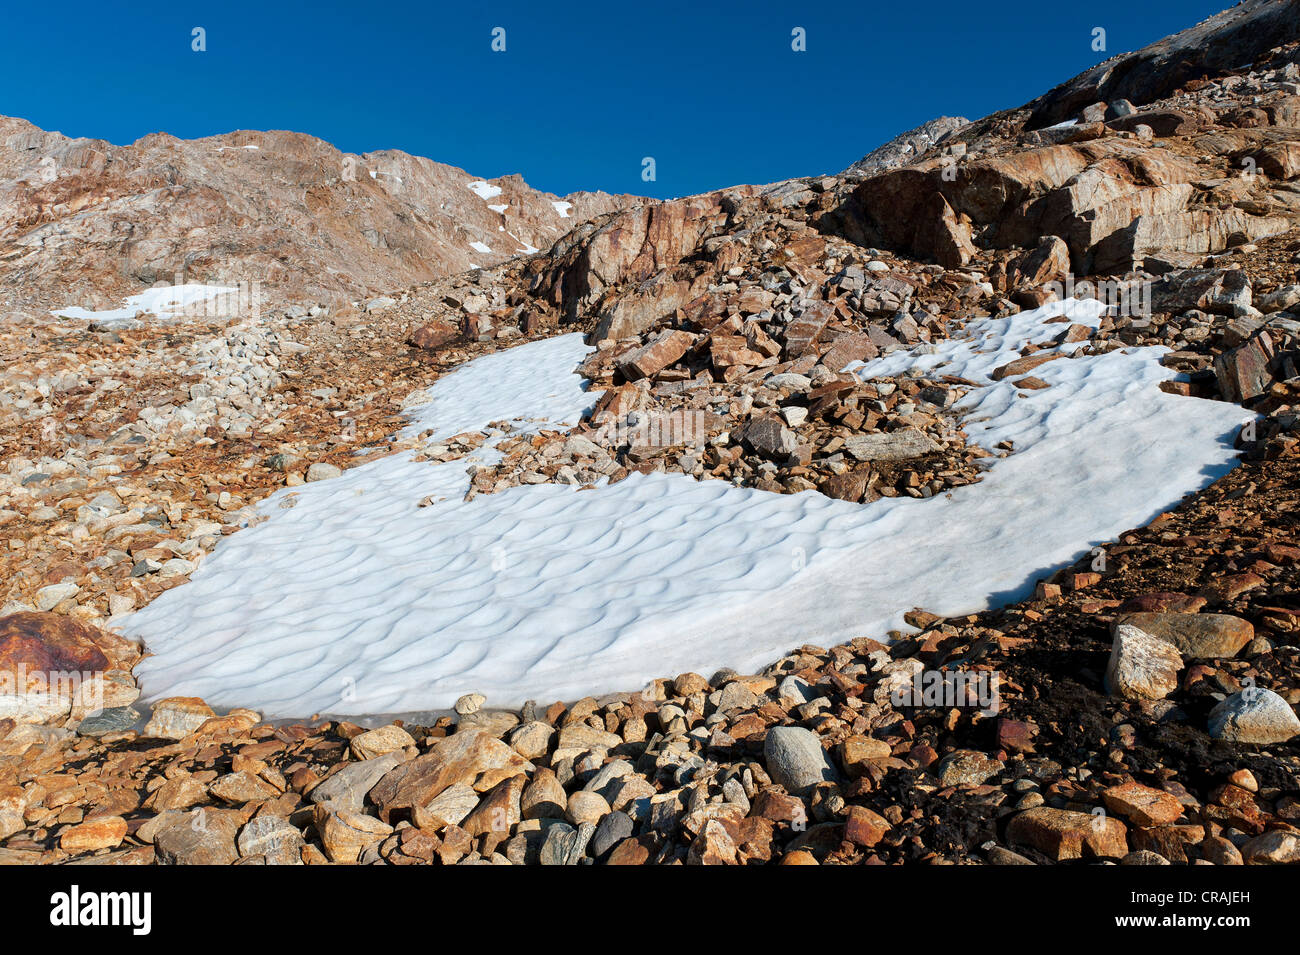 Snowfield on Mittivakkat Glacier, Ammassalik Peninsula, East Greenland, Greenland - Stock Image